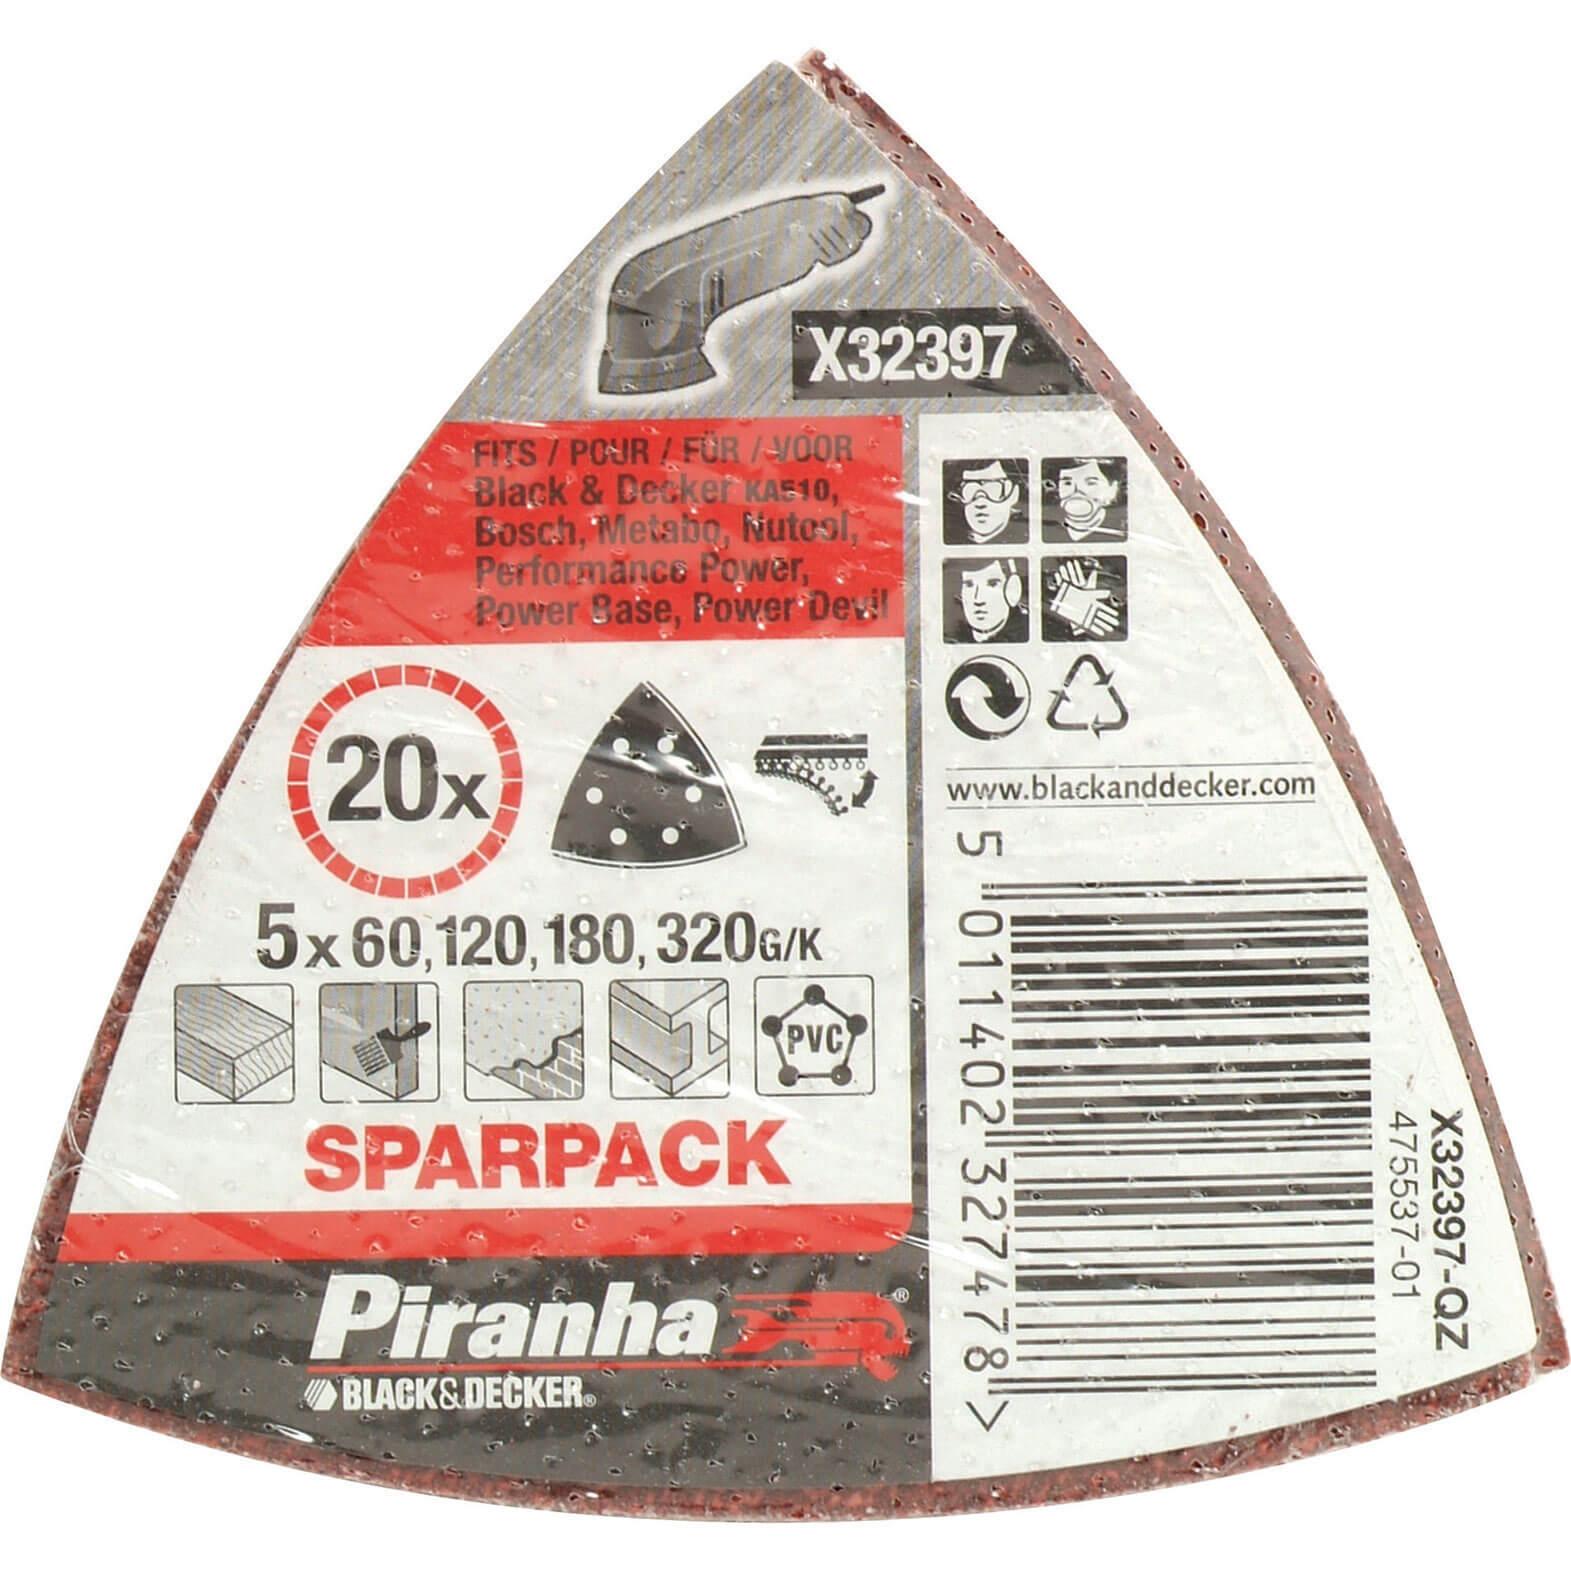 Image of Black & Decker Piranha Quick Fit Delta Sanding Sheets Assorted Grit Pack of 20